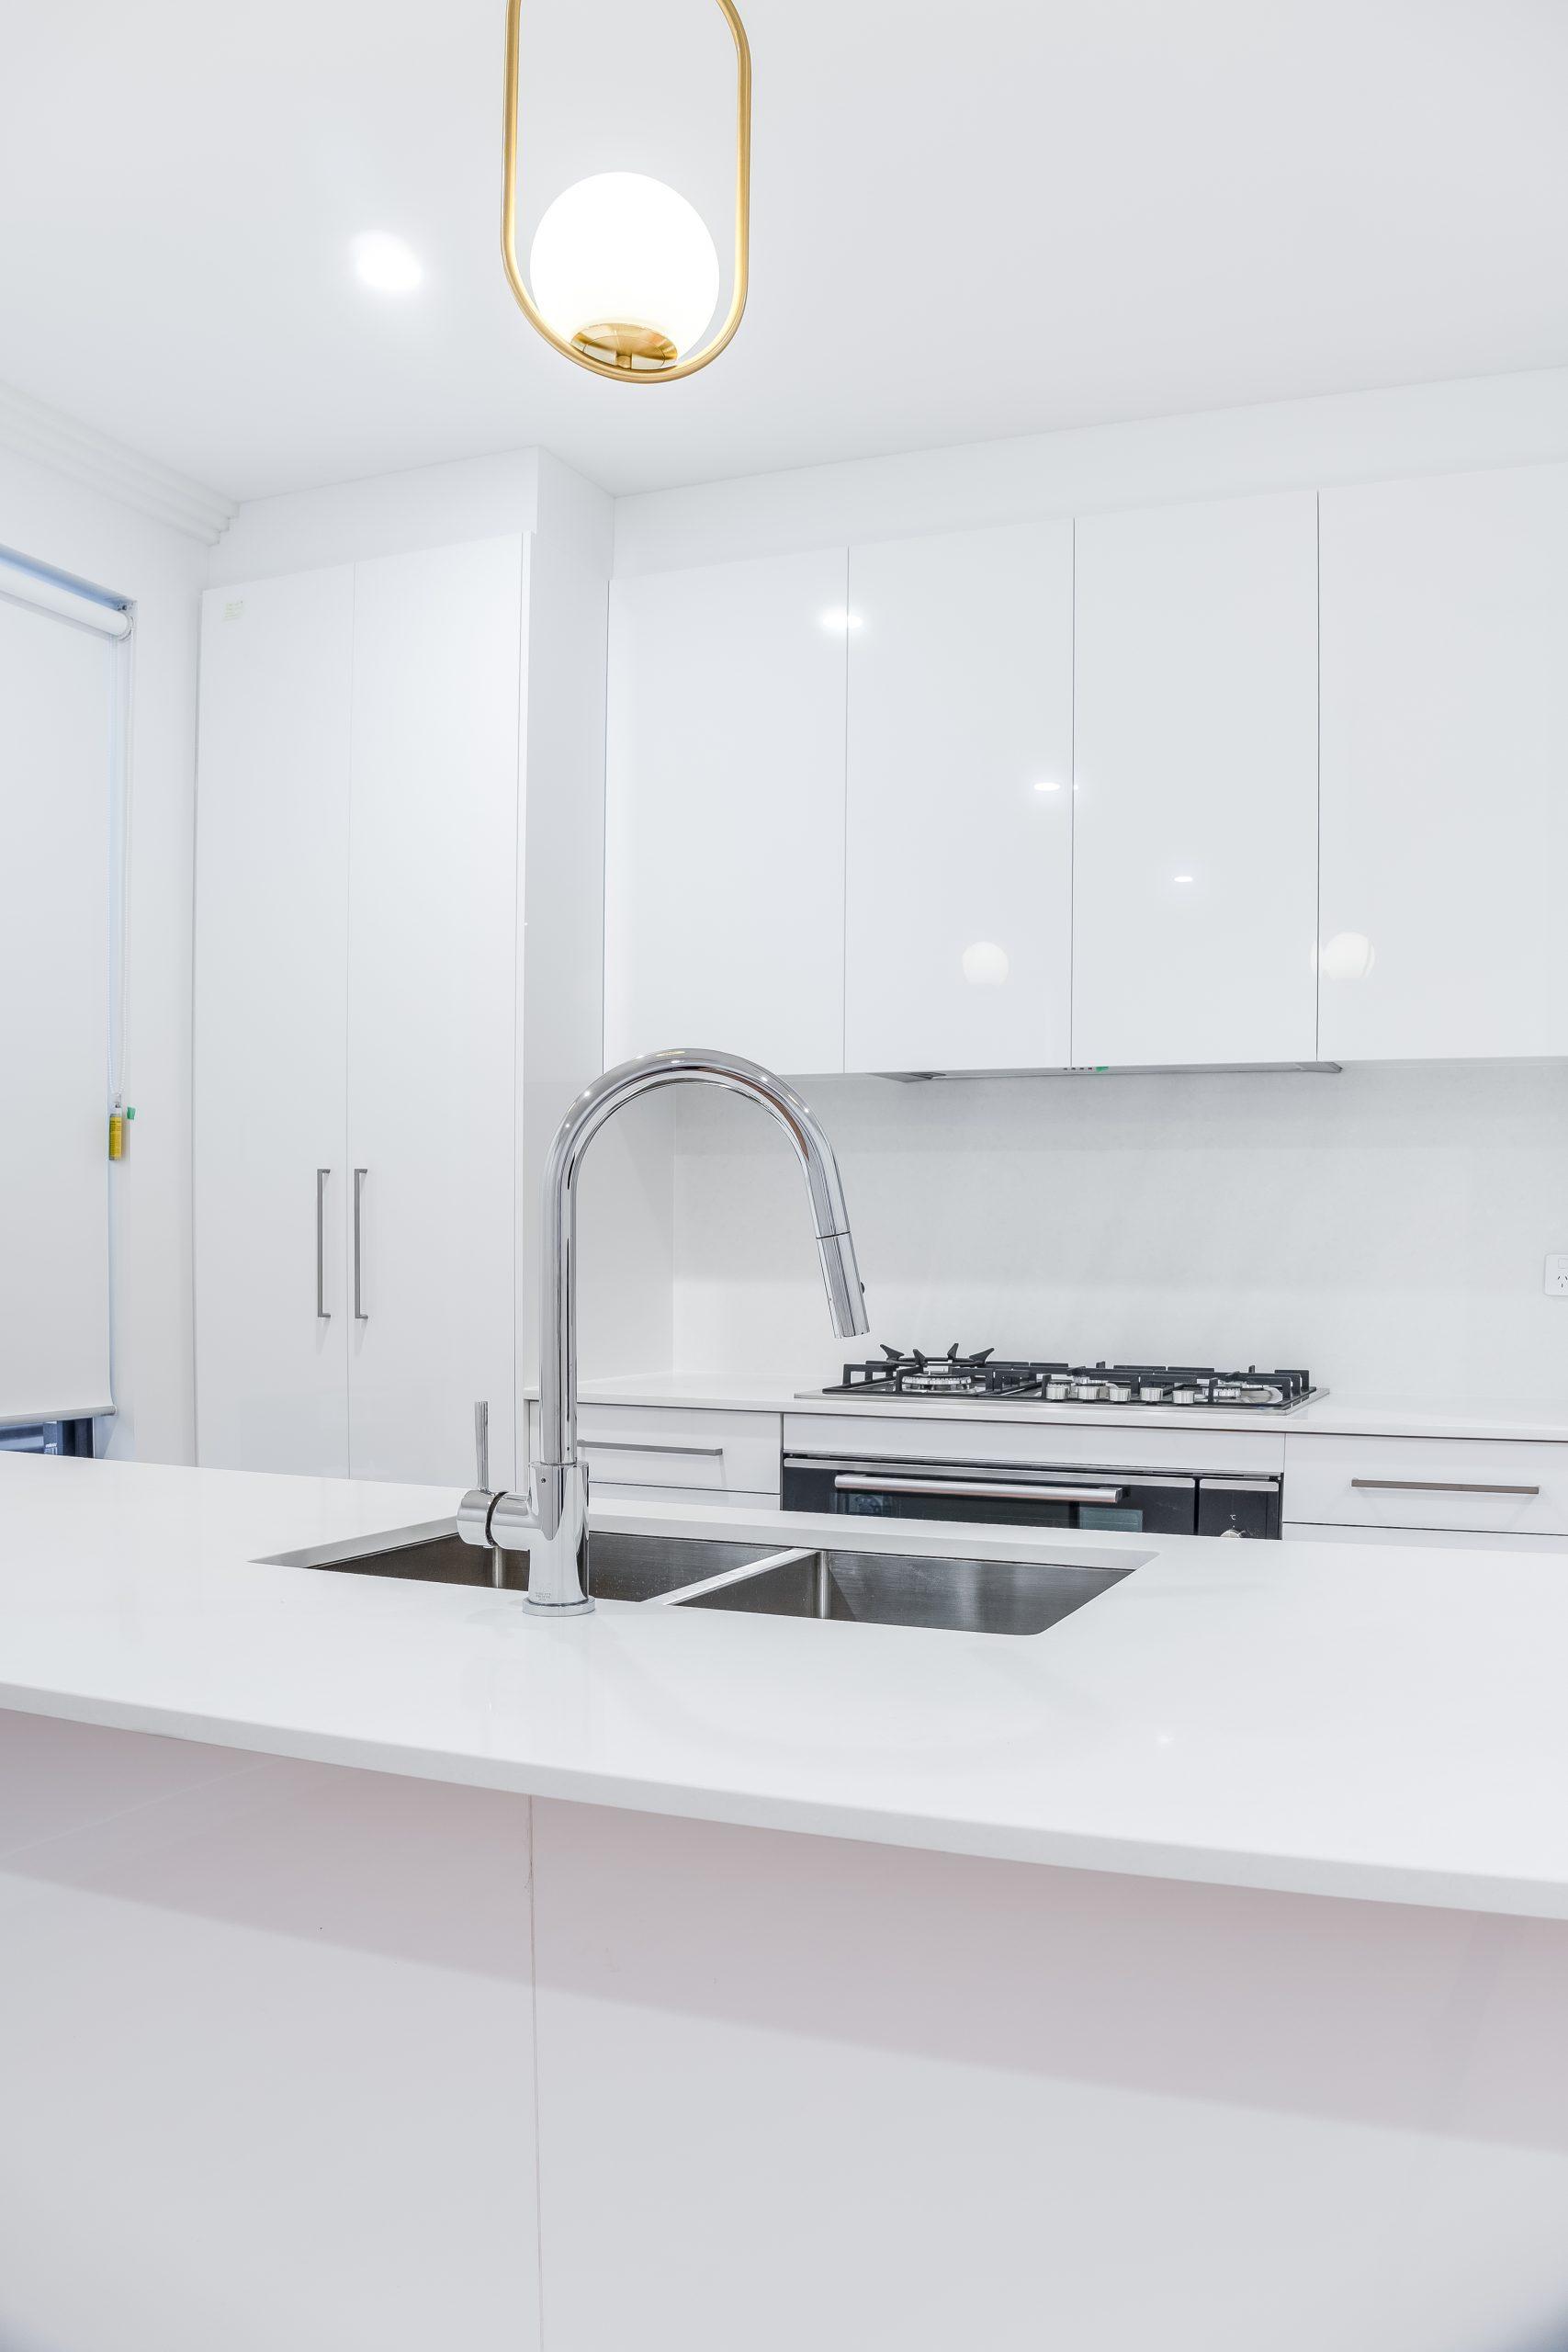 Tranmere - Richardson - HBC Homes Adelaide - _DSC2761